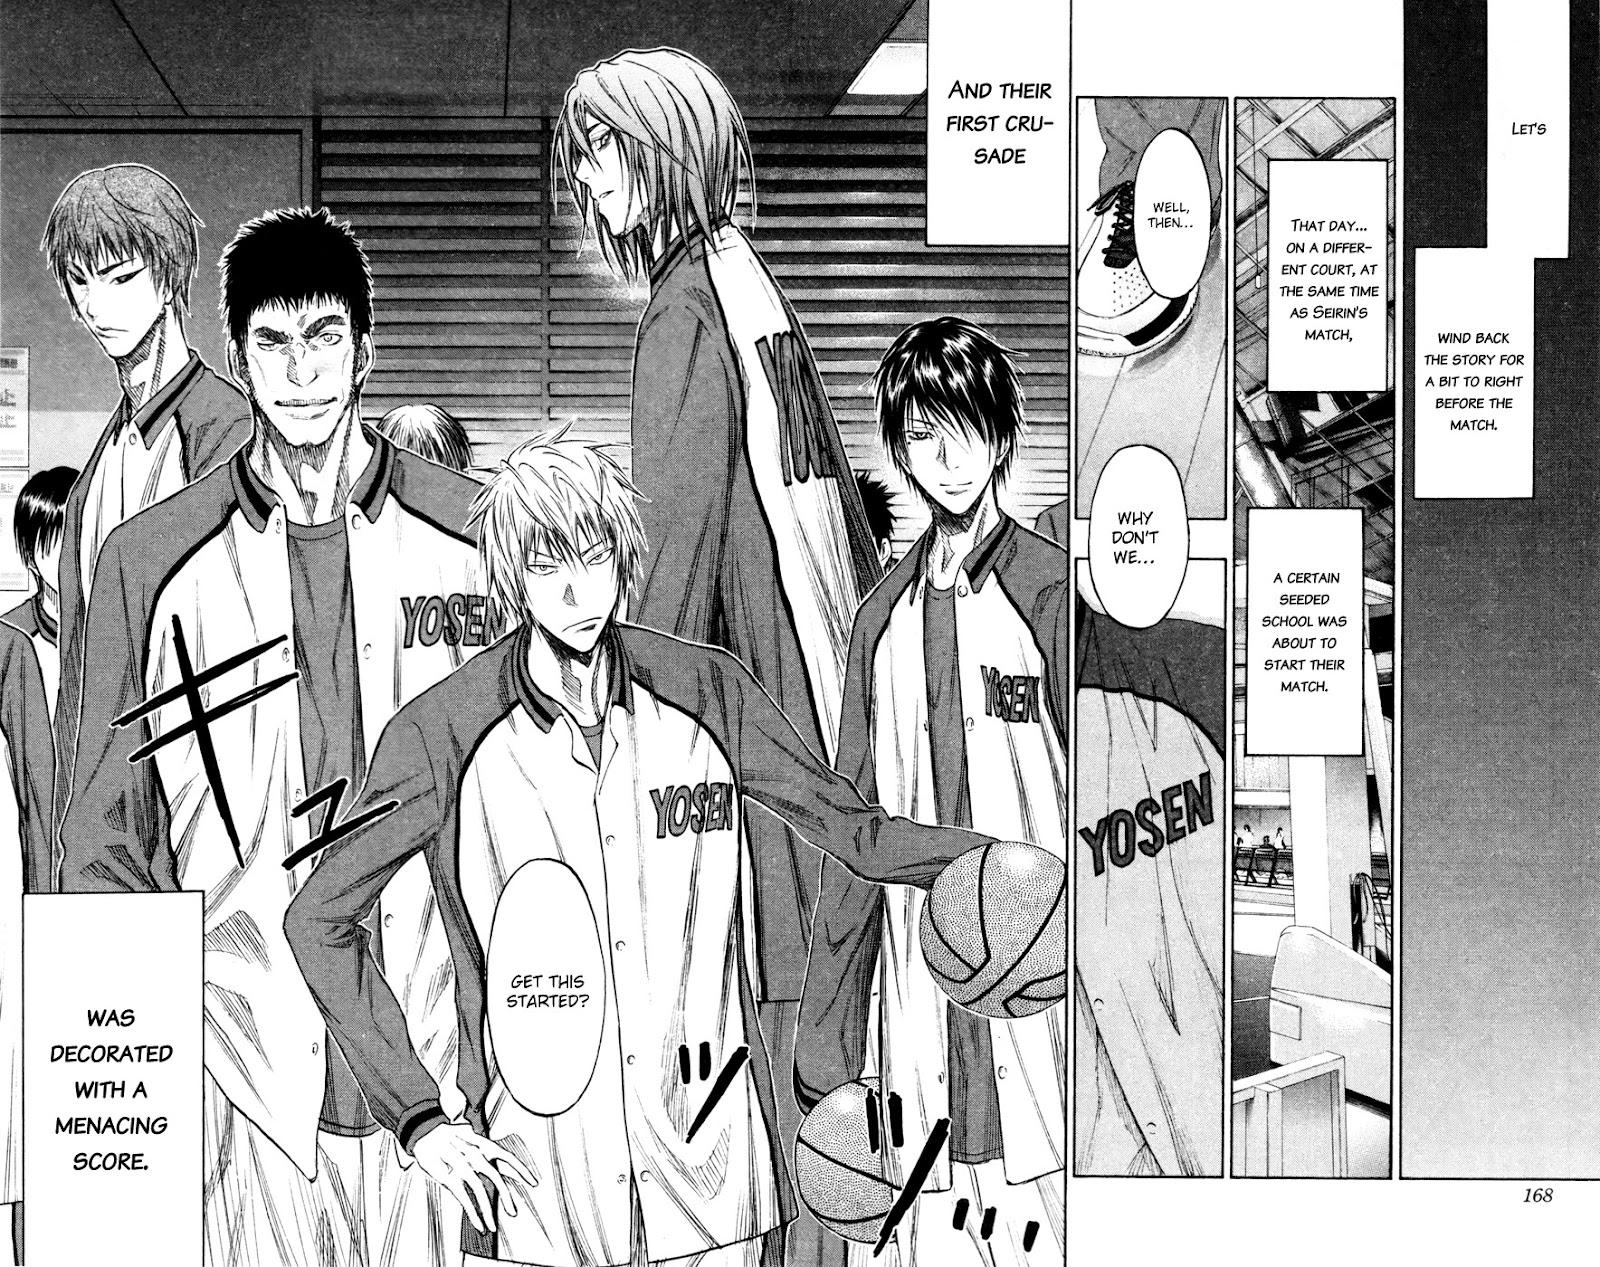 Kuroko no Basket Manga Chapter 143 - Image 18-19